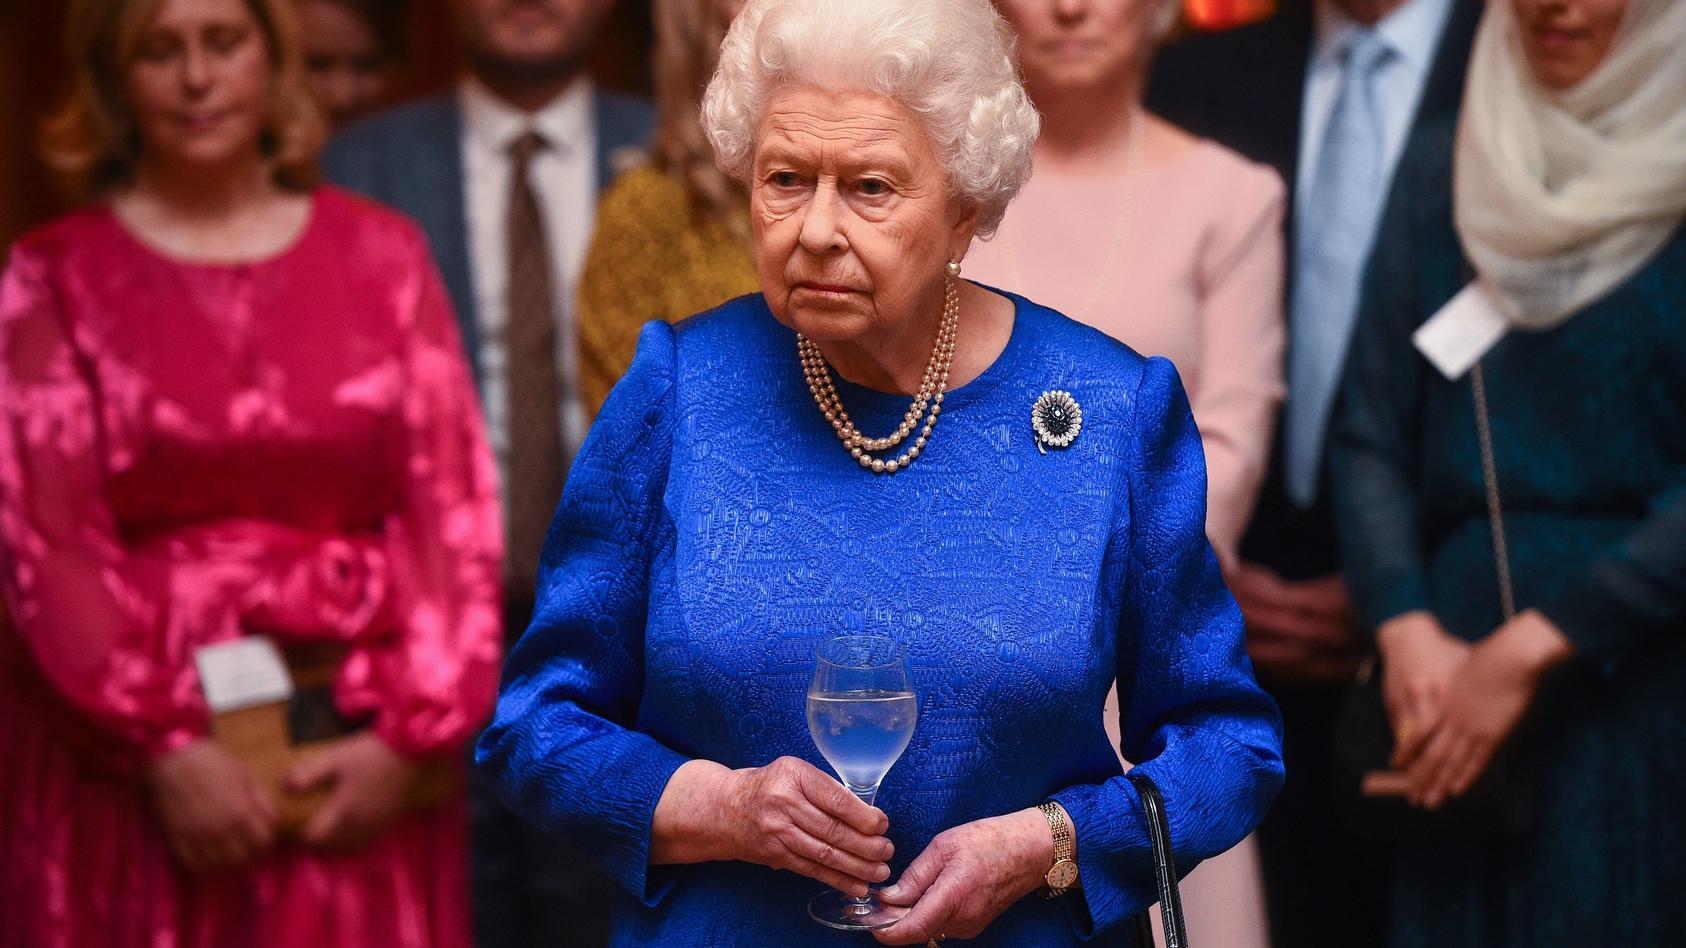 queen-elisabeth-ii-soll-zukunftig-ihren-schlummertrunk-lieber-weglassen